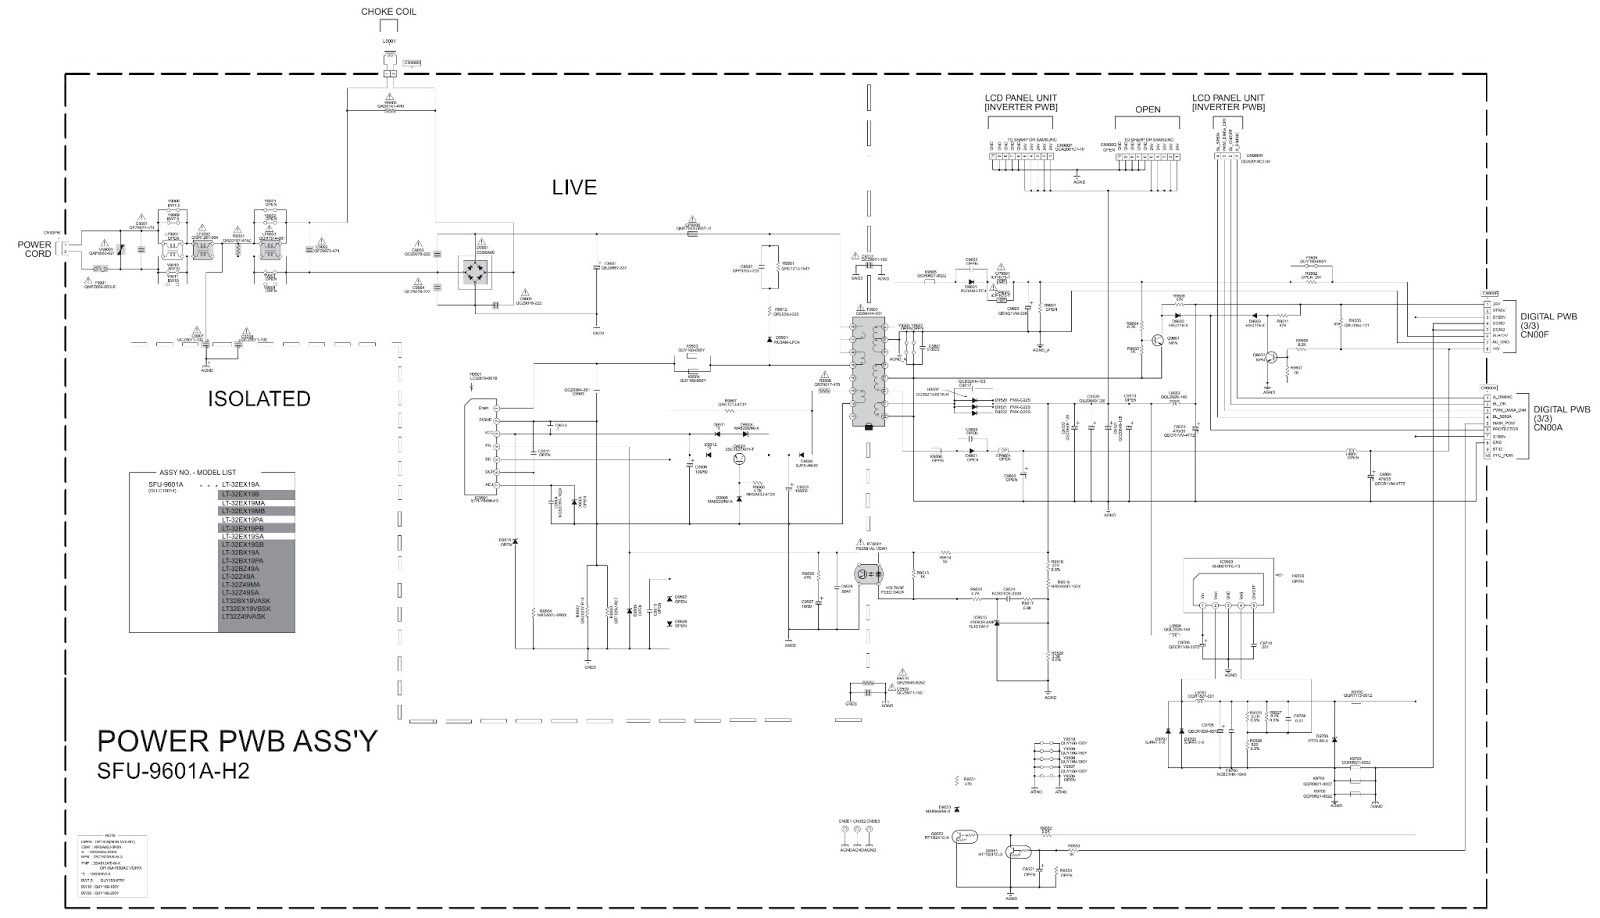 hight resolution of lt 32ex29 lt 32ex19 jvc lcd tv main power supply schematic circuit diagram jvc tv